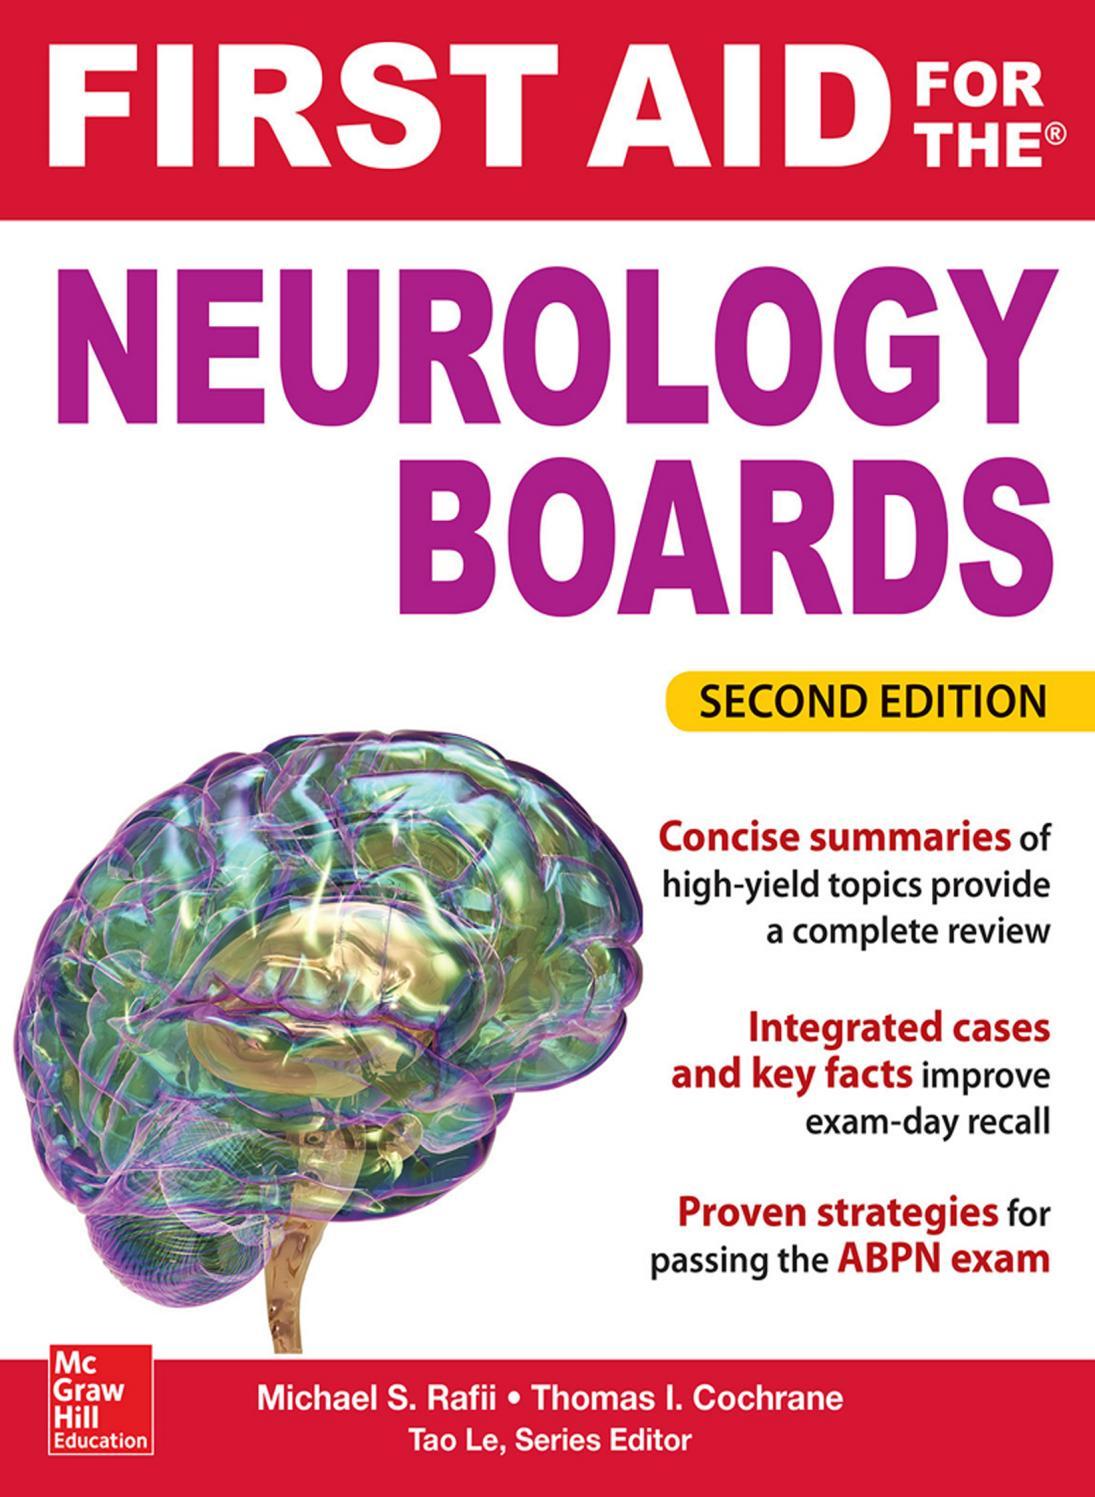 First aid for the neurology boards 2e by shaikh bdulgafar